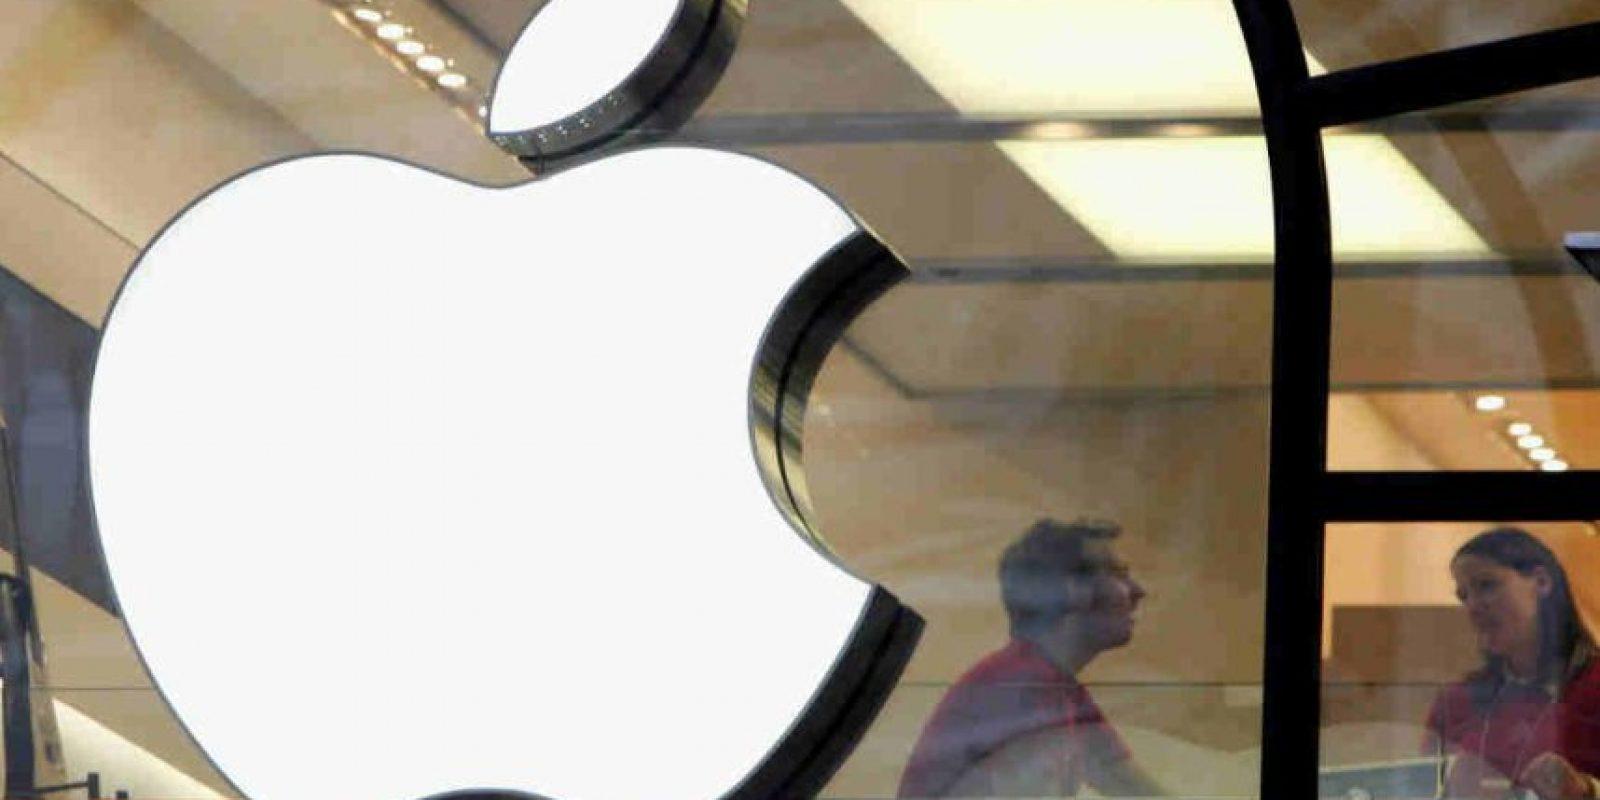 Informó que la vida útil de sus iPhone e iPad es de 3 años. Foto:Getty Images